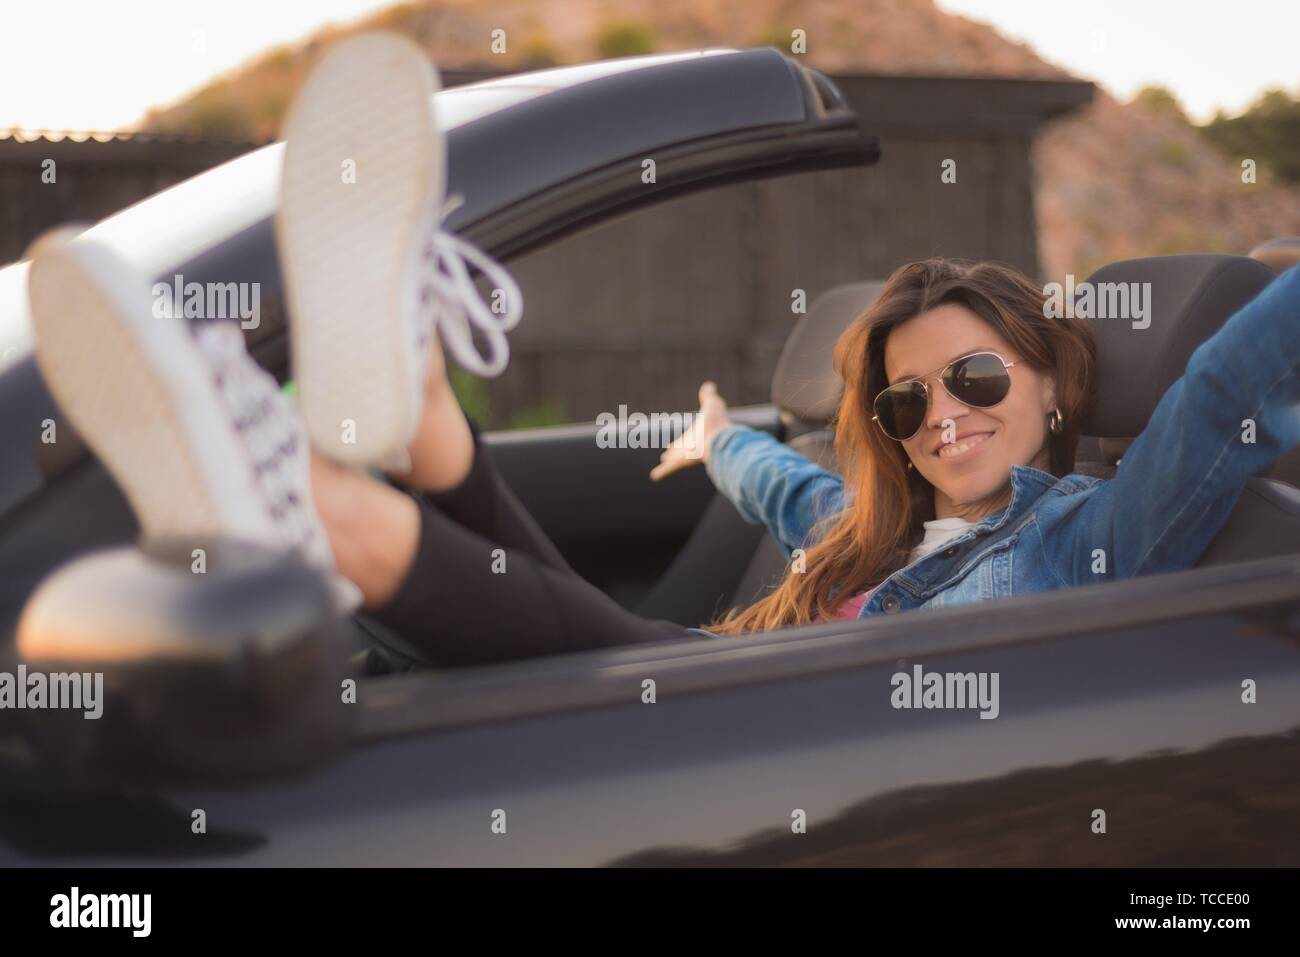 Happy young woman enjoying her convertible car. - Stock Image